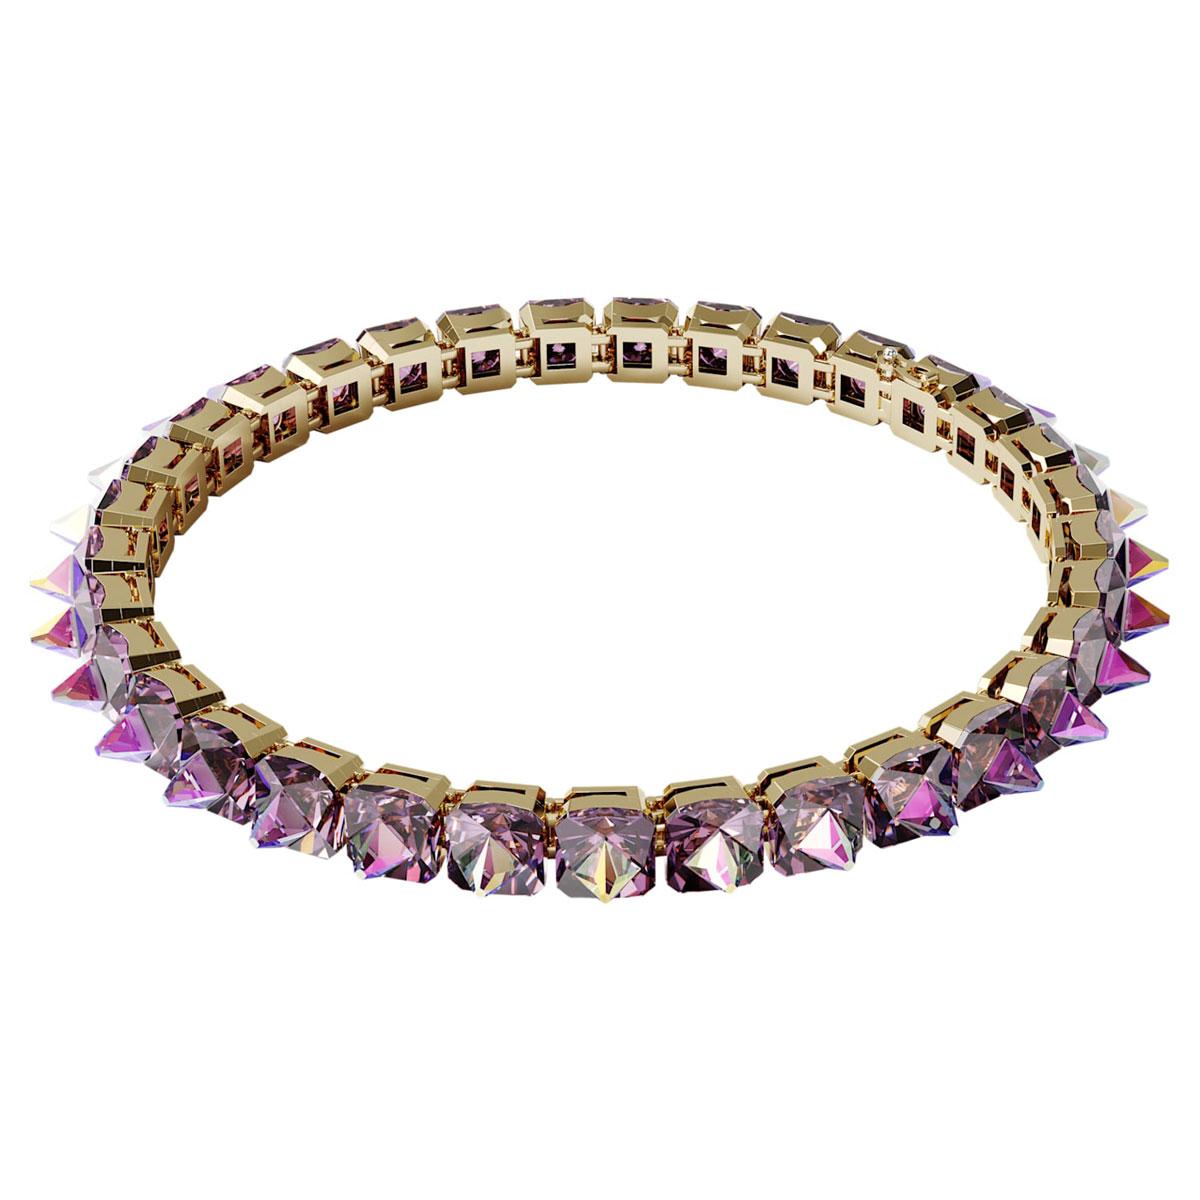 Swarovski Chroma Choker Necklace , Spike Crystals, Purple, Gold-Tone Plated